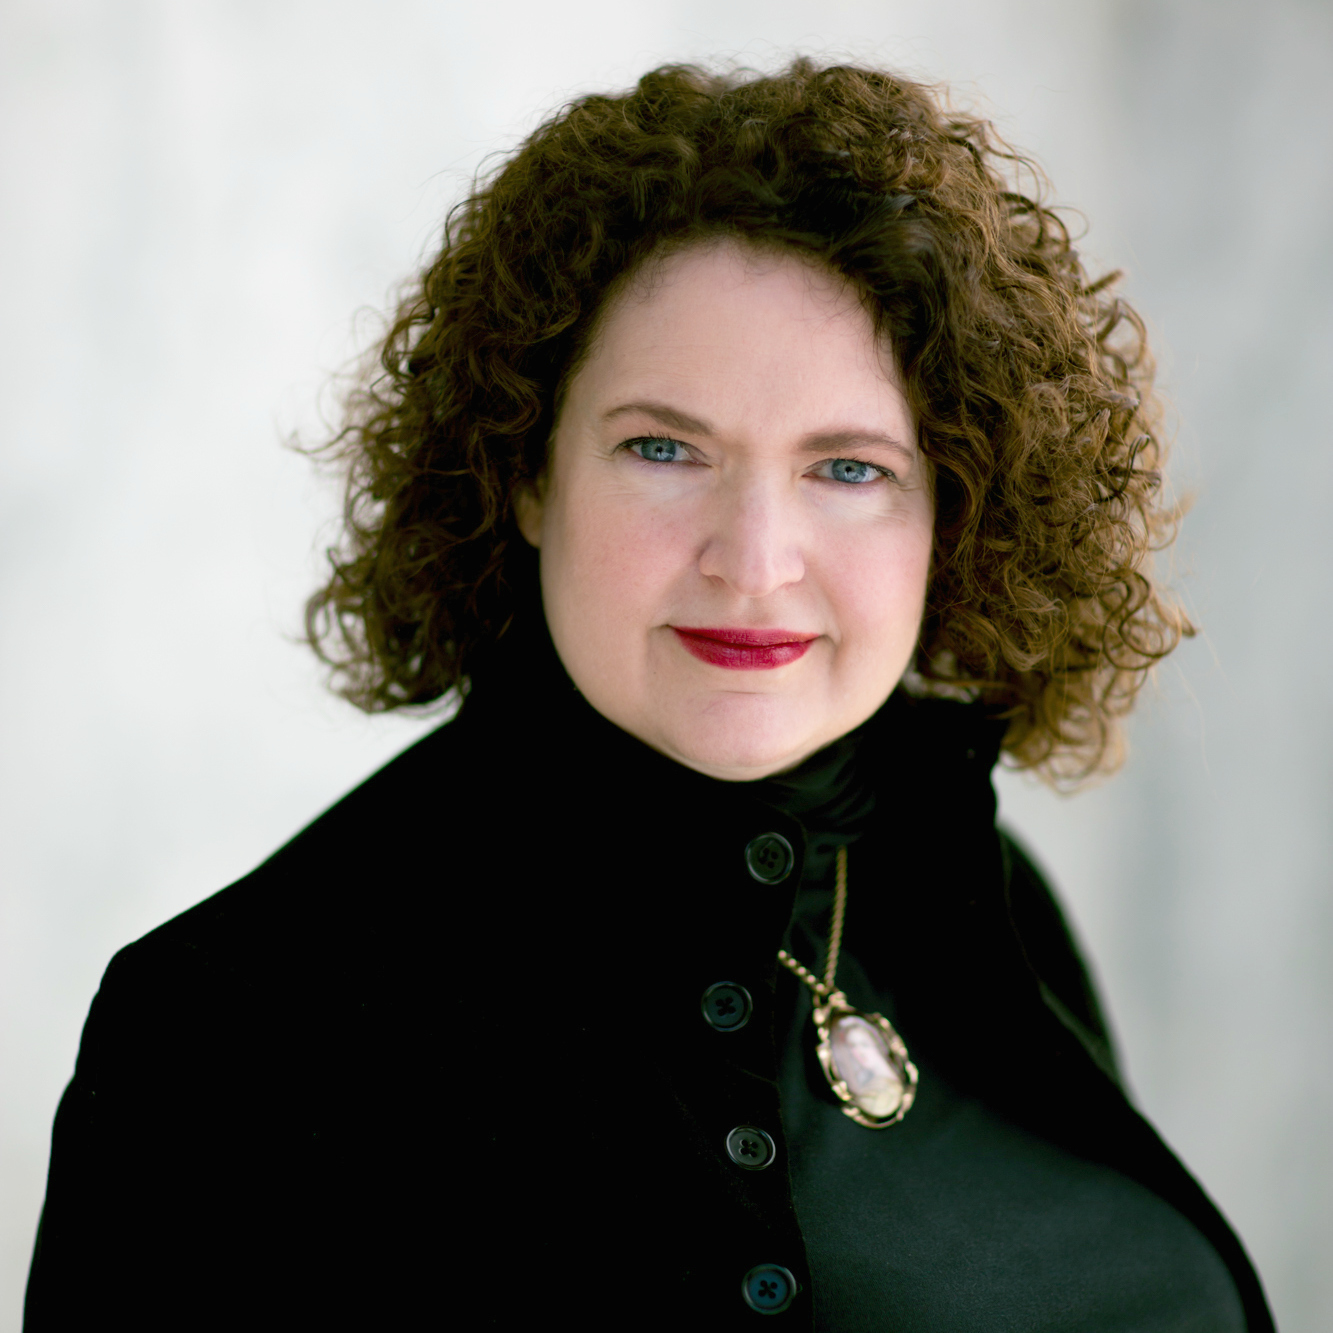 Janice Helwig